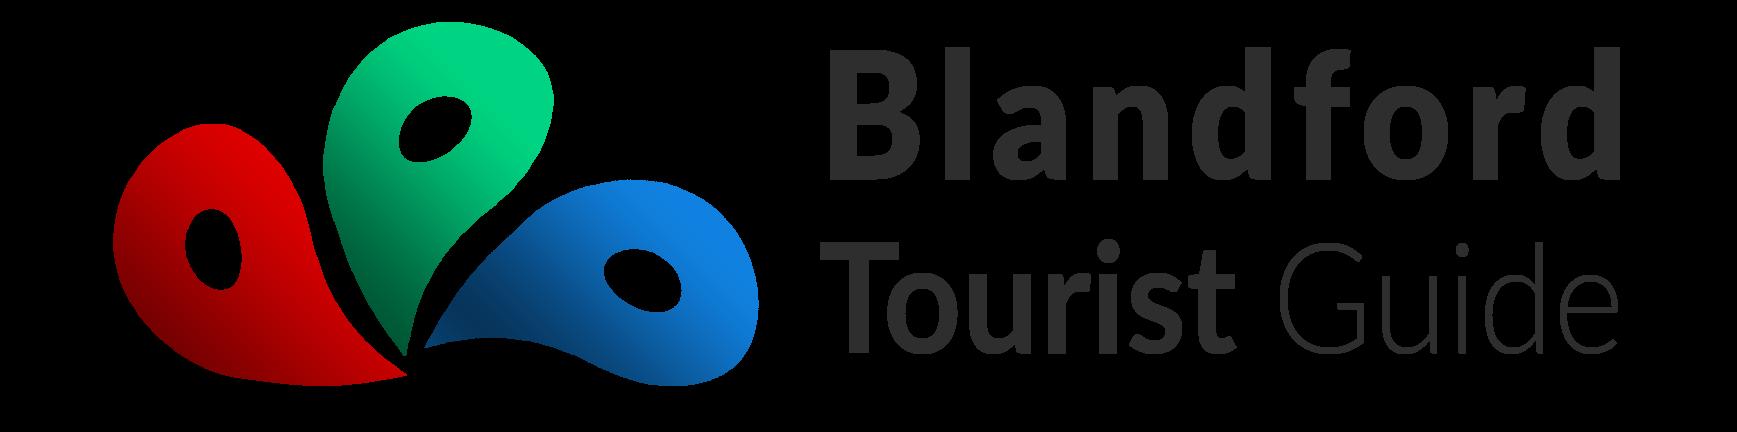 blandford-tc website